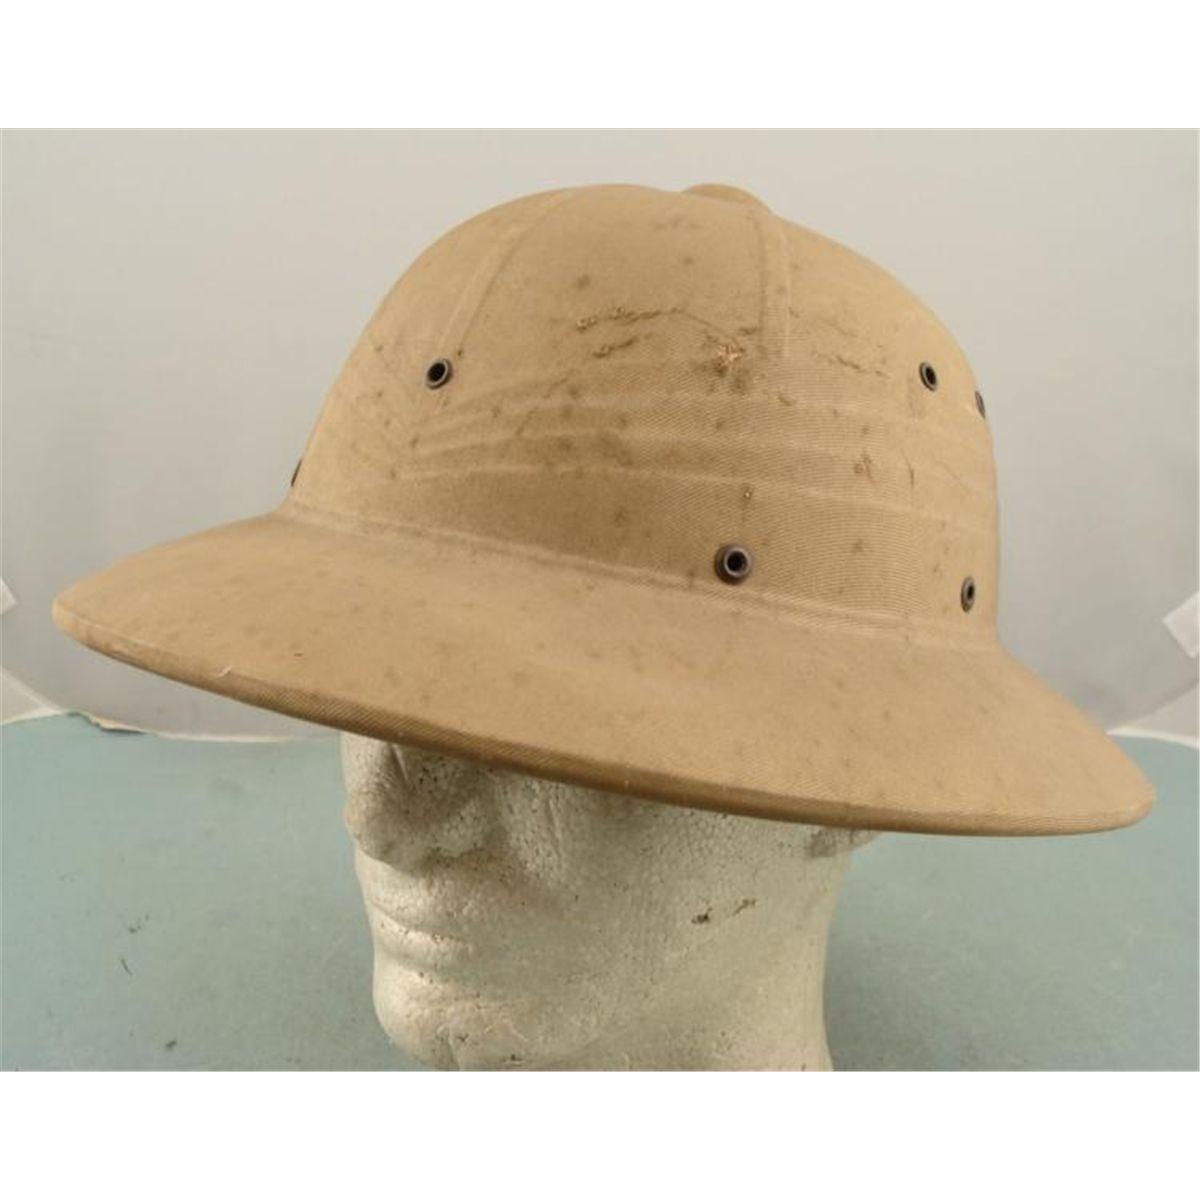 d231c6c4af Image 1   ORIGINAL 1942 WWII US PACIFIC THEATRE NAVY PITH HELMET ...